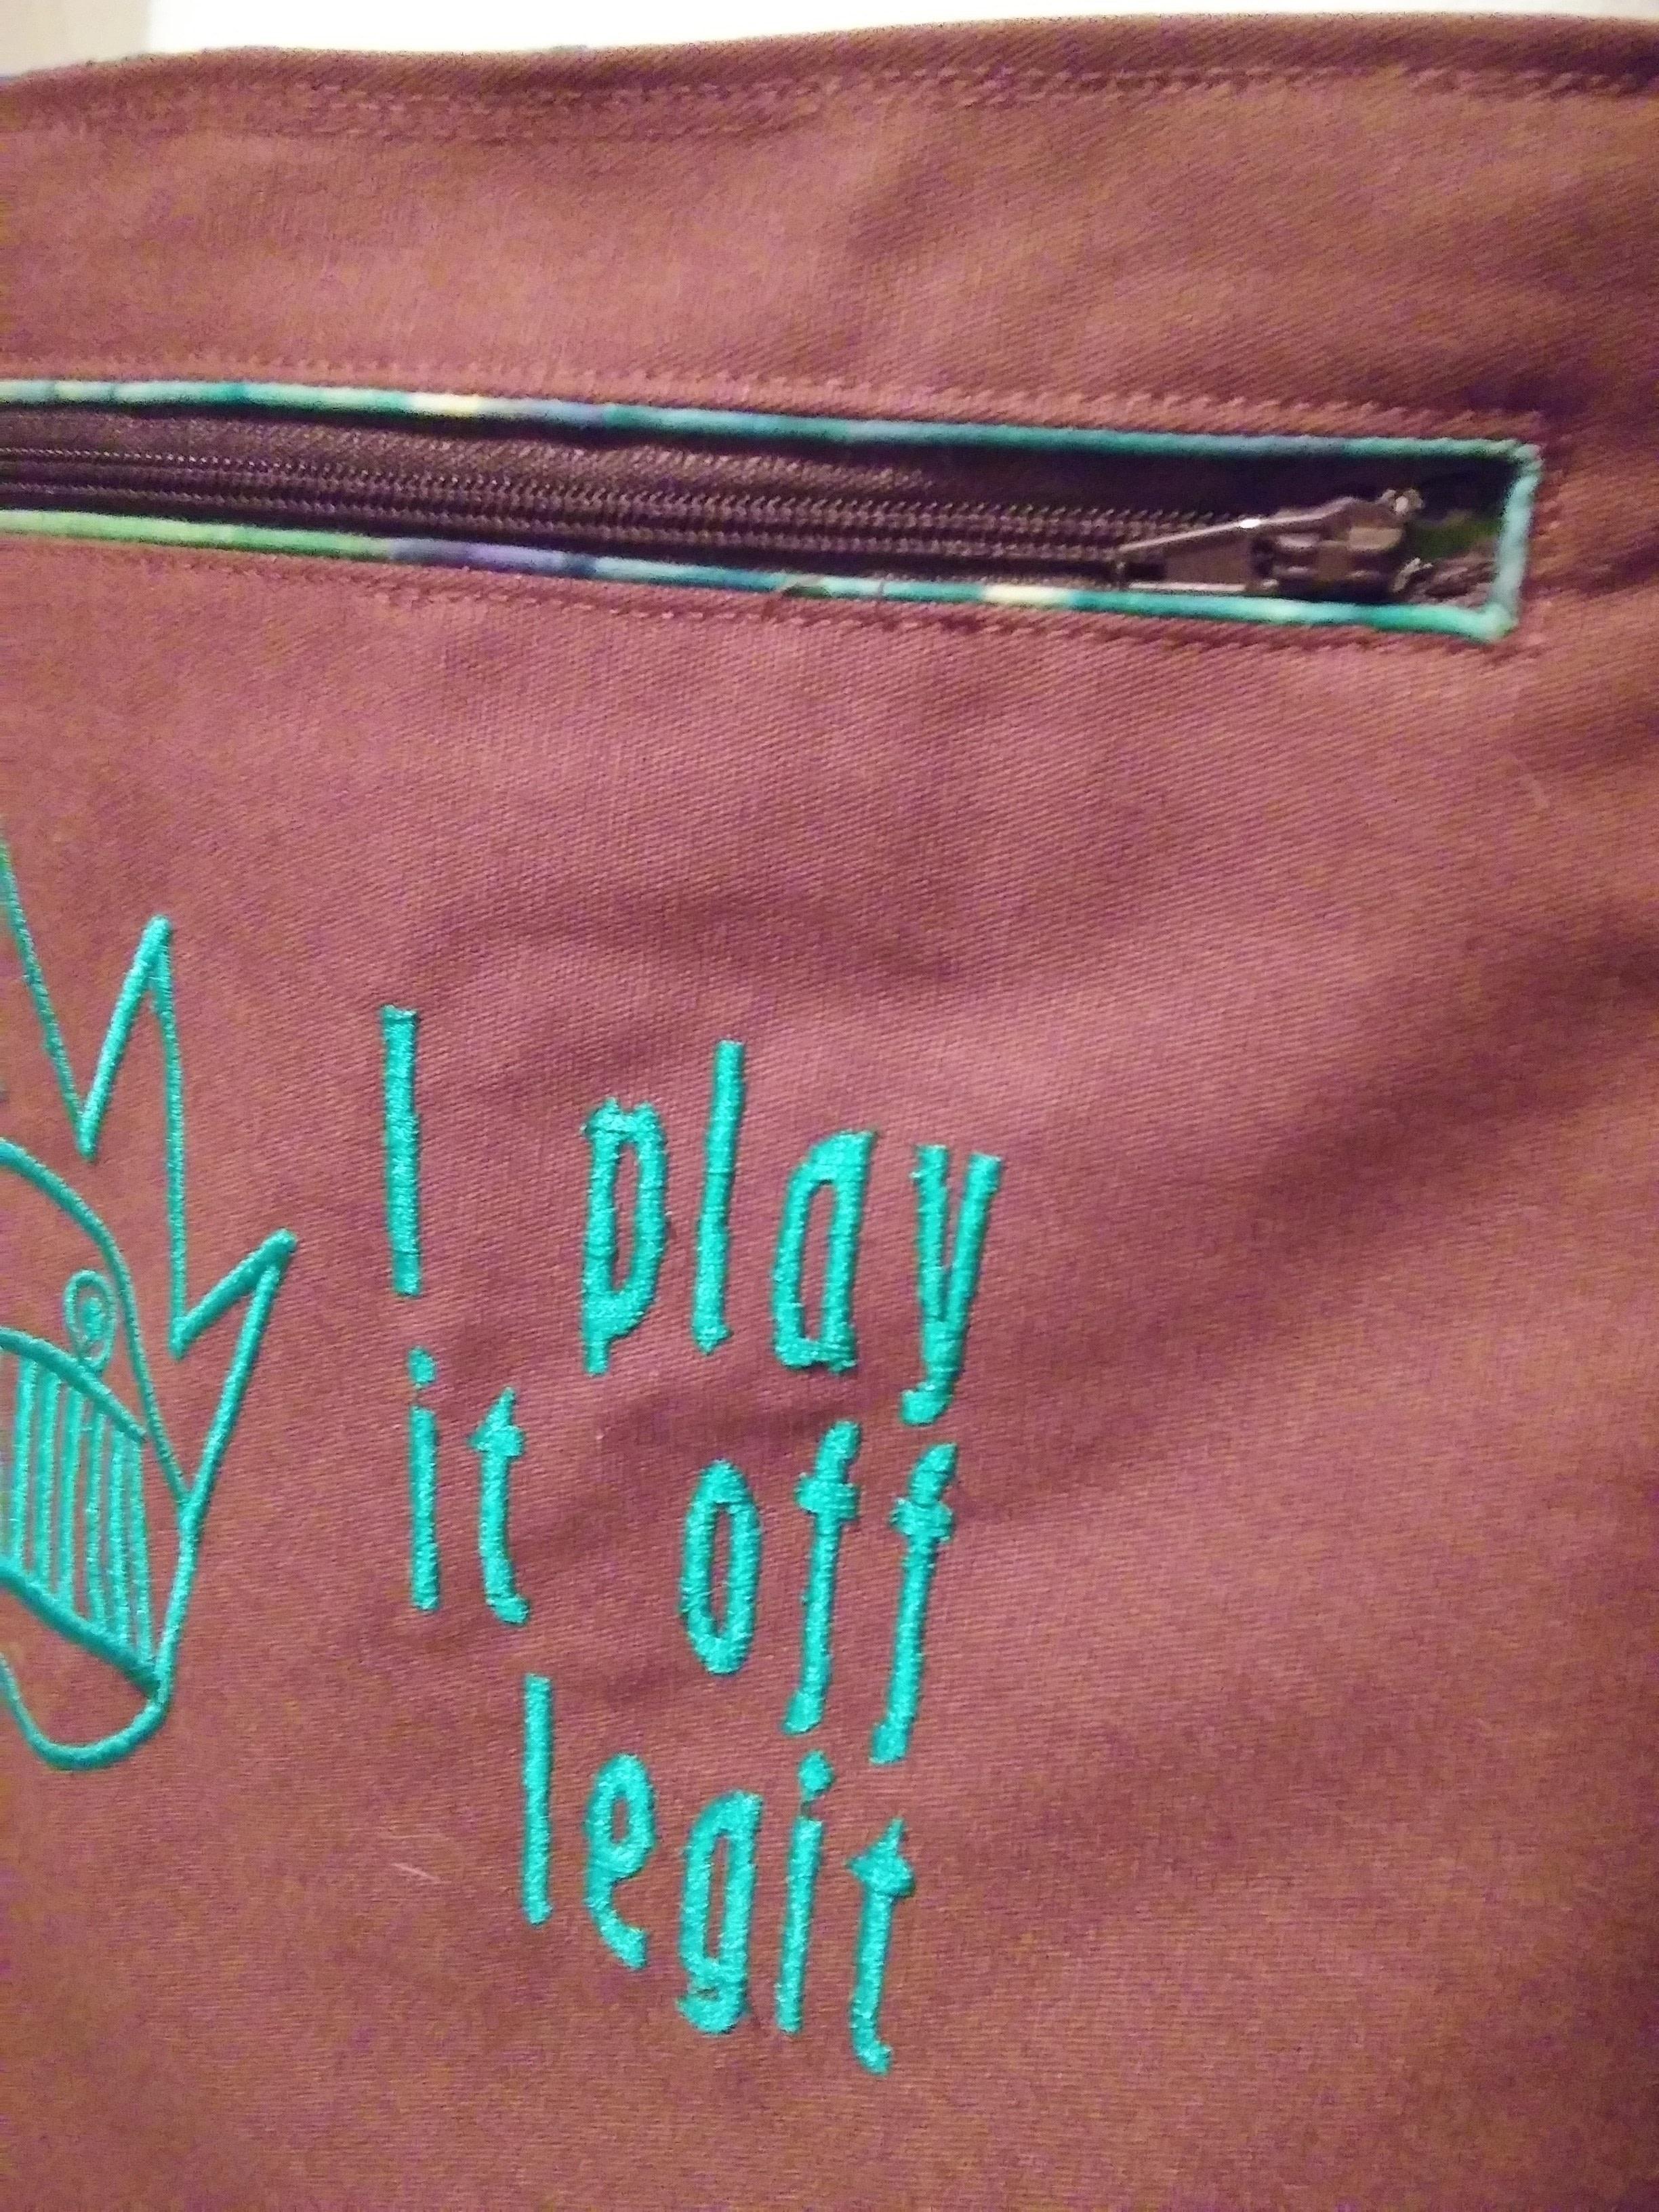 Custom Ween Purses 183 An Across Body Bag 183 Sewing On Cut